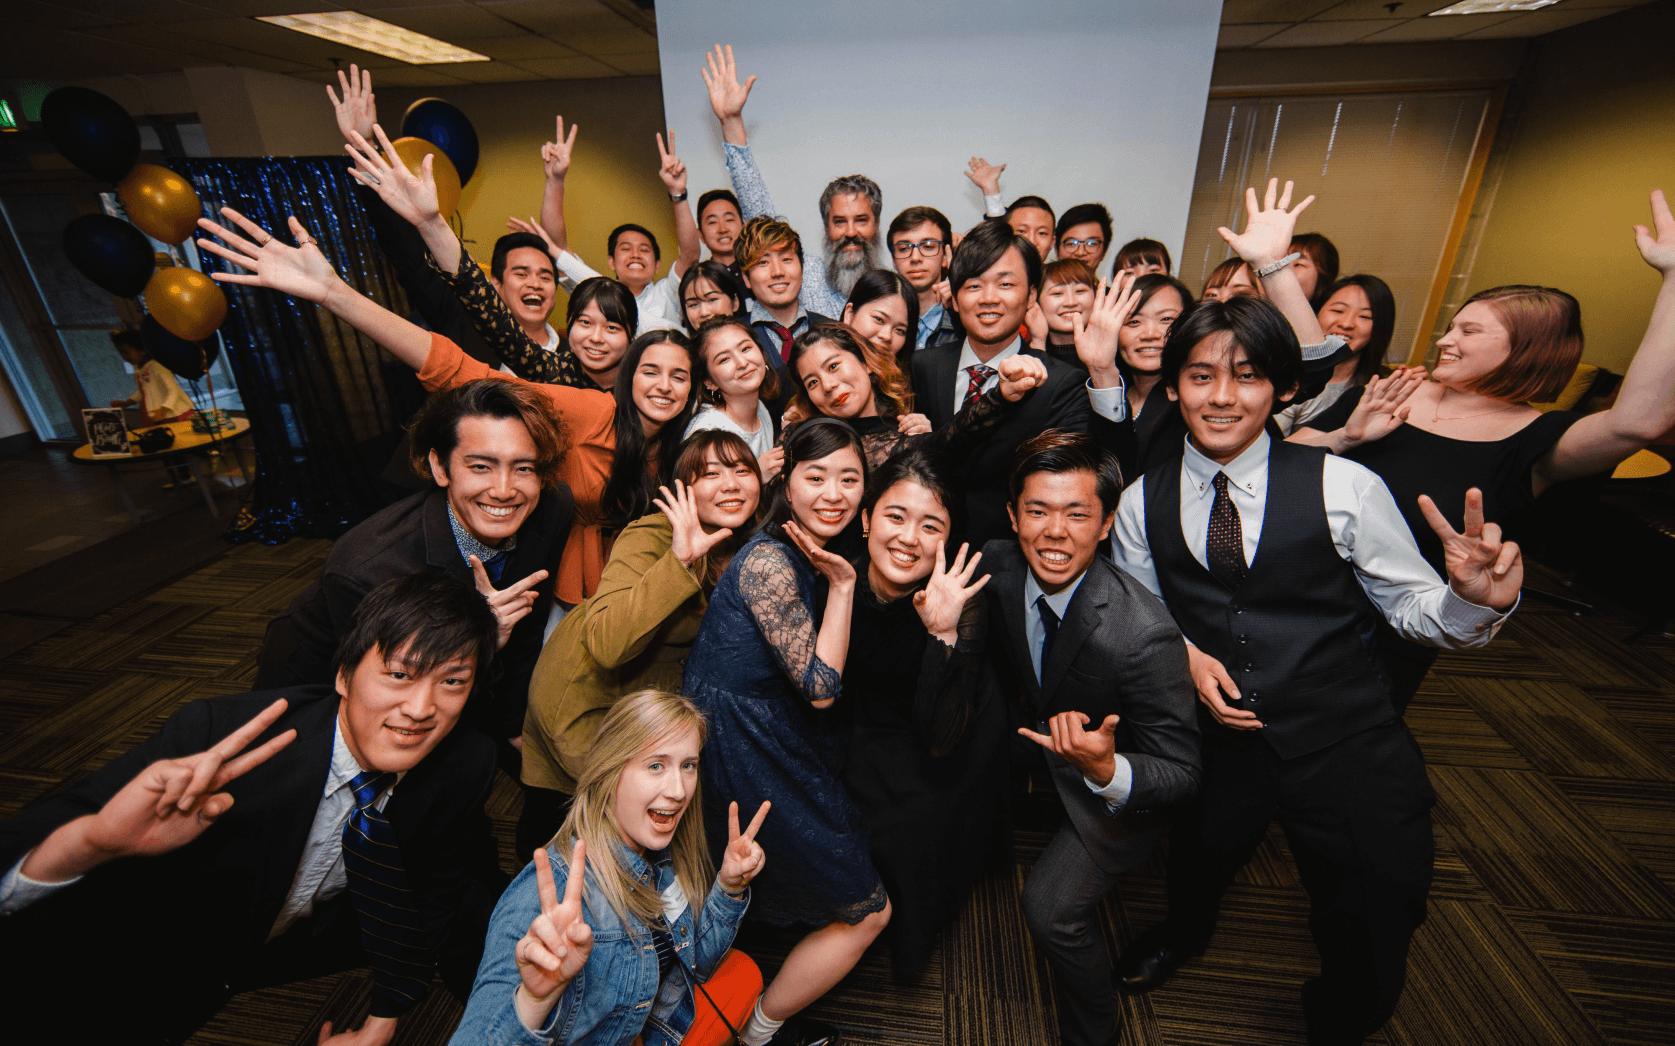 Next Travel Talk will focus on Kitakyushu, Japan